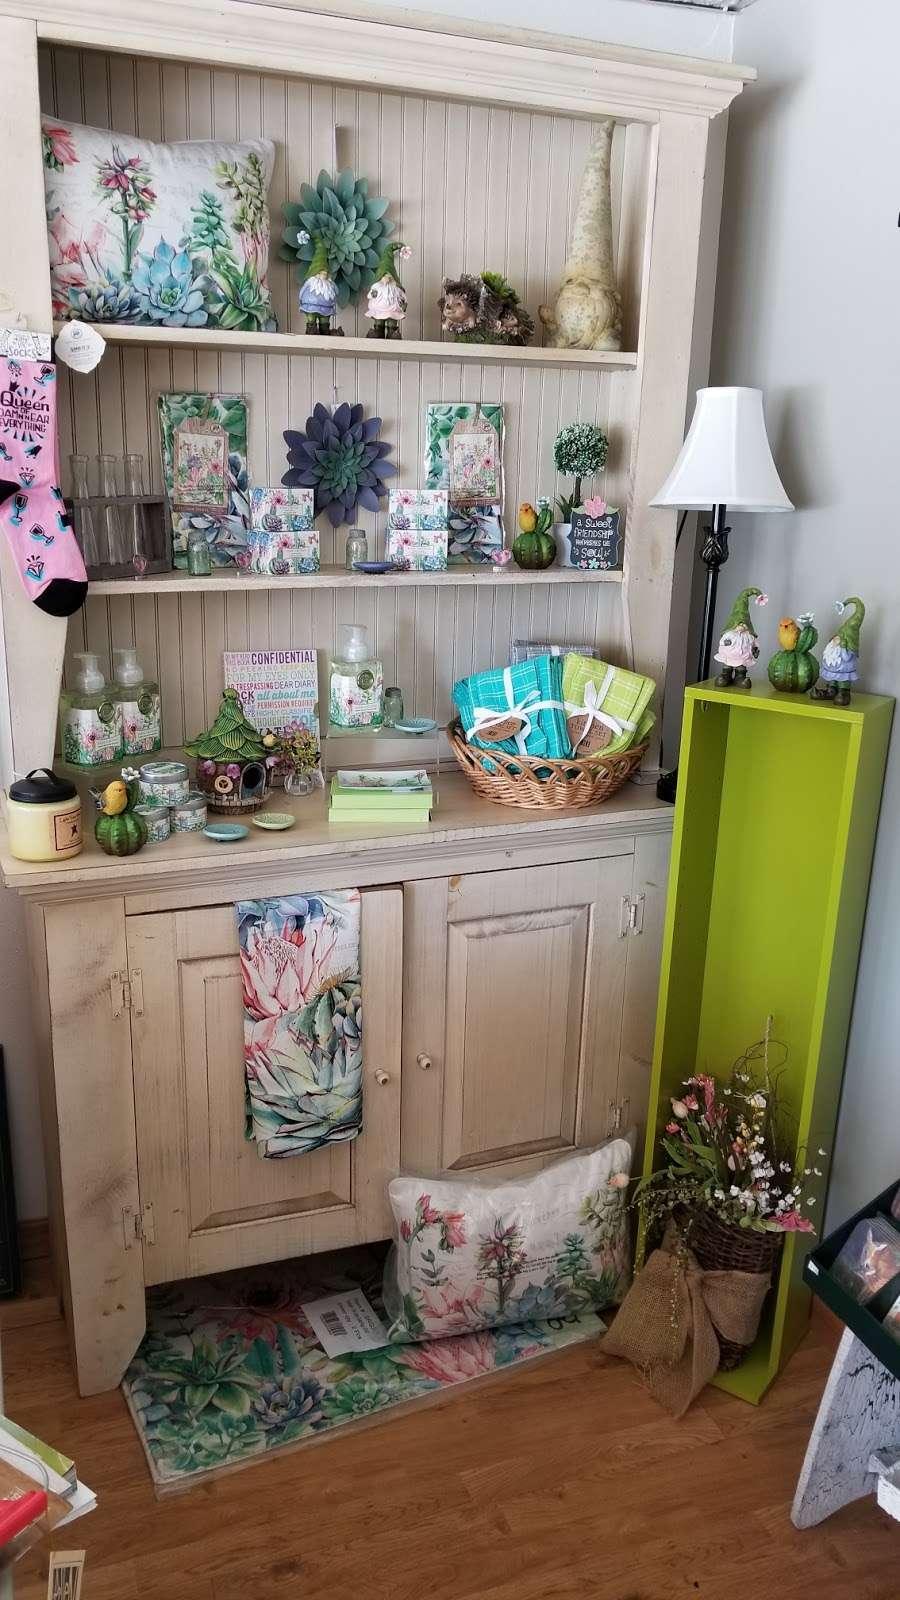 Krickettes Gift Shop - store    Photo 2 of 8   Address: 640 E Ryan Rd, Oak Creek, WI 53154, USA   Phone: (414) 775-2017